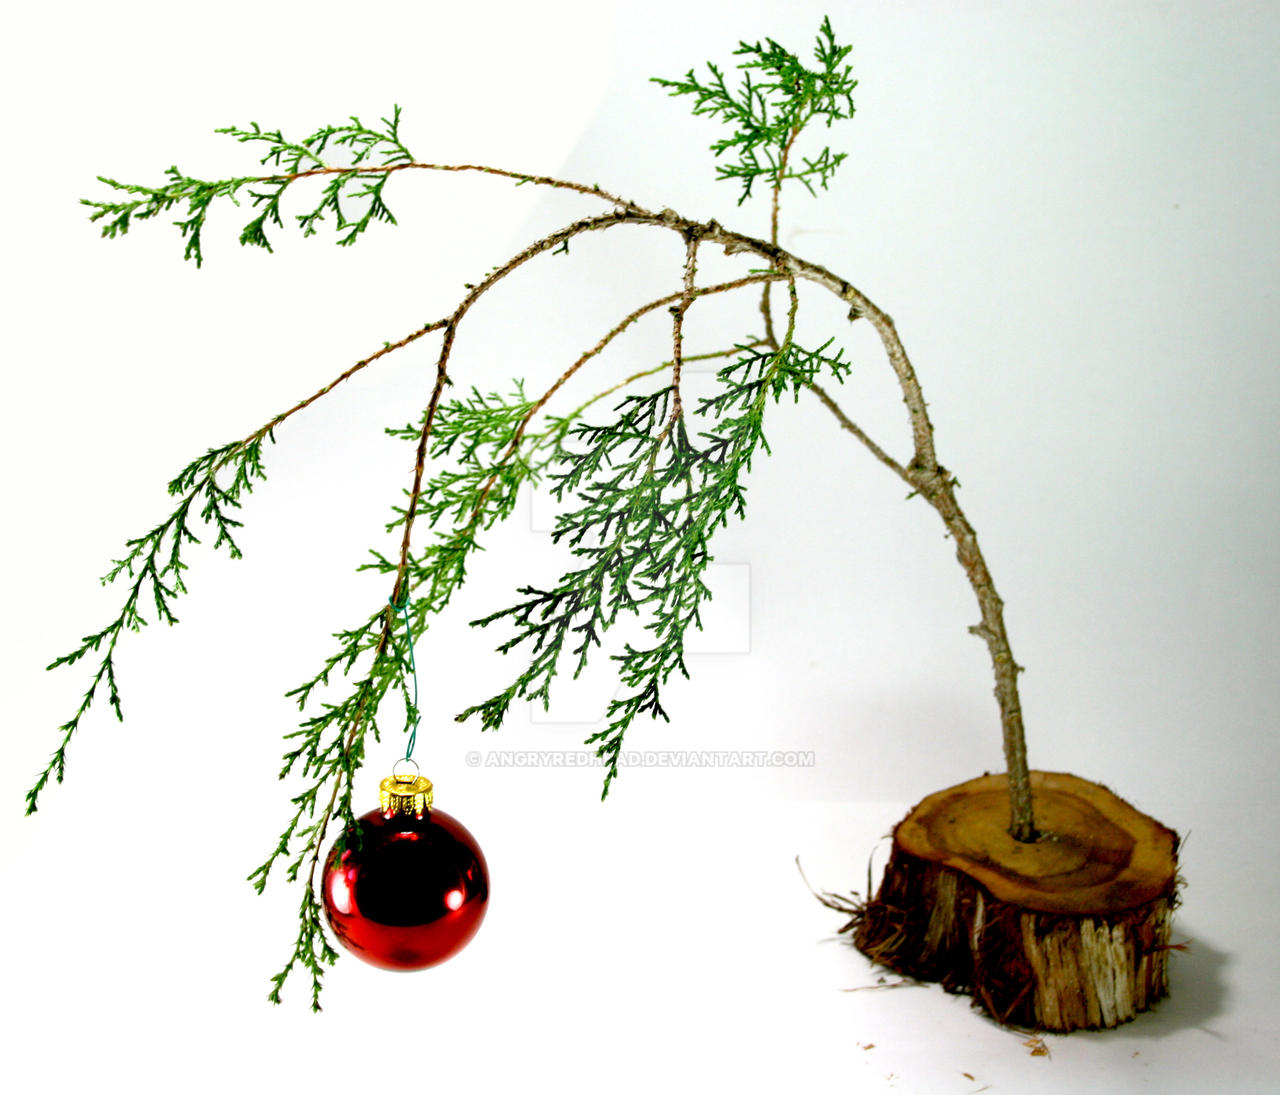 charlie_brown_christmas_tree_by_angryred